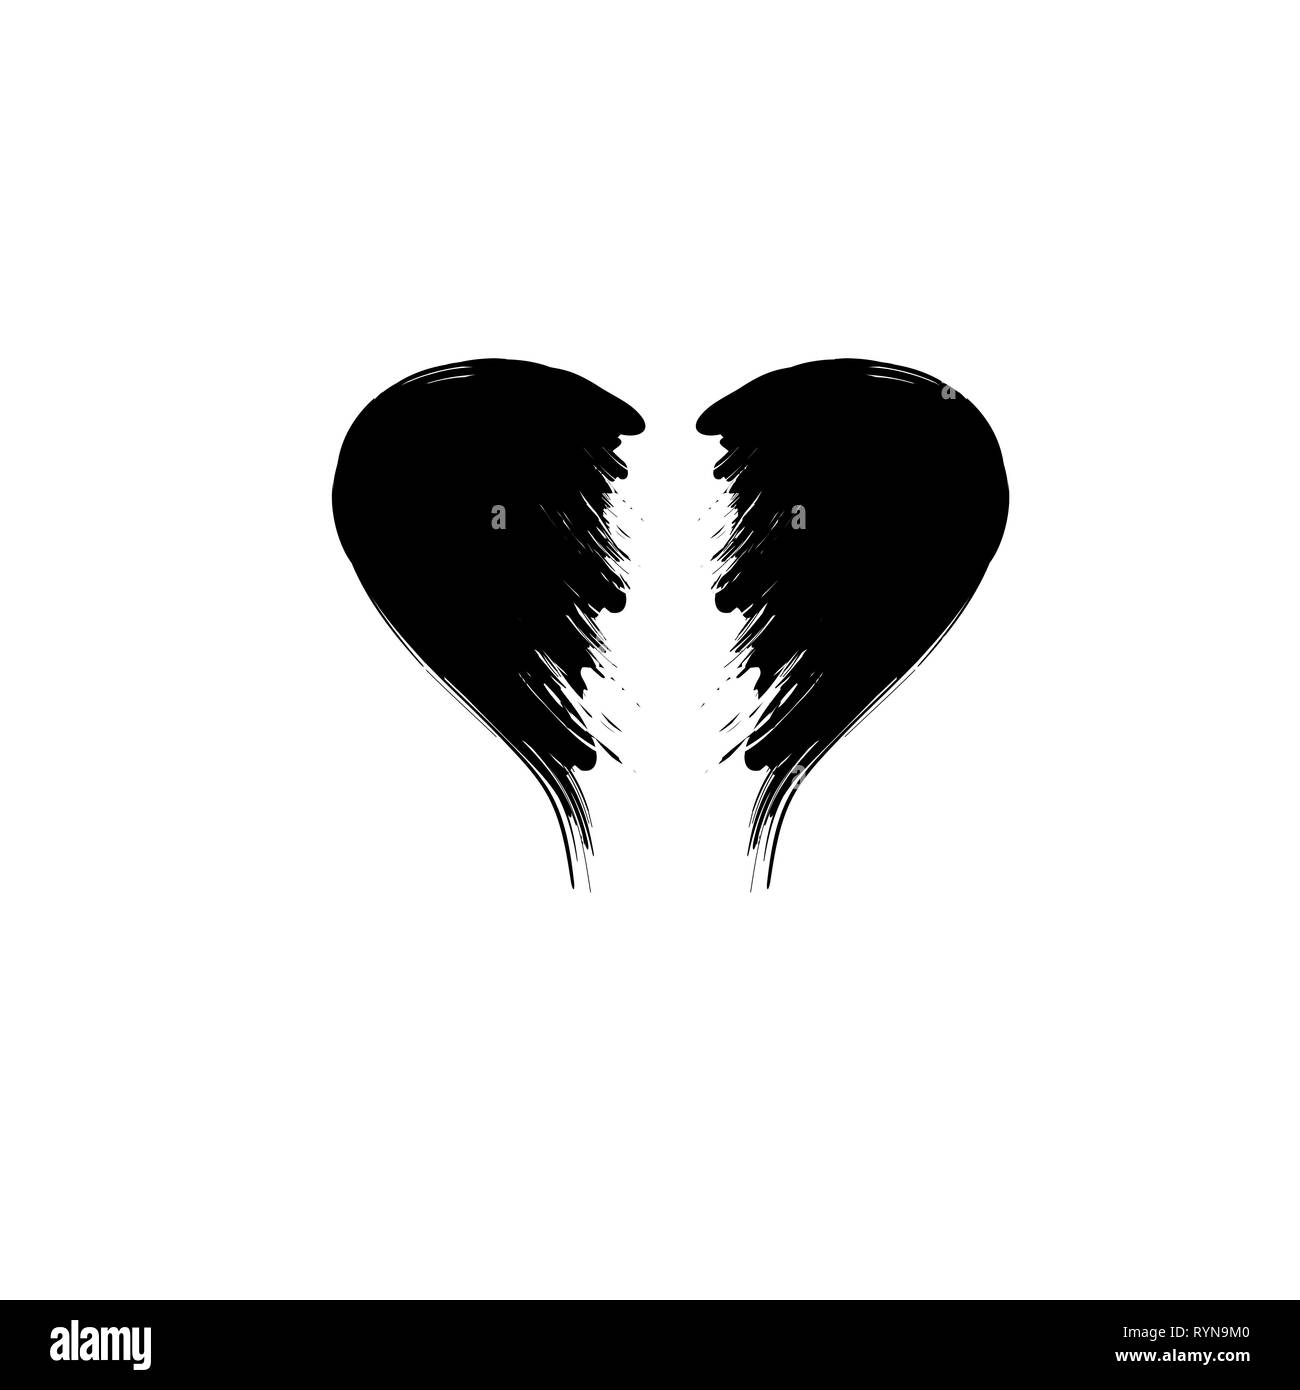 broken heart grunge black silhouette isolated on white background RYN9M0